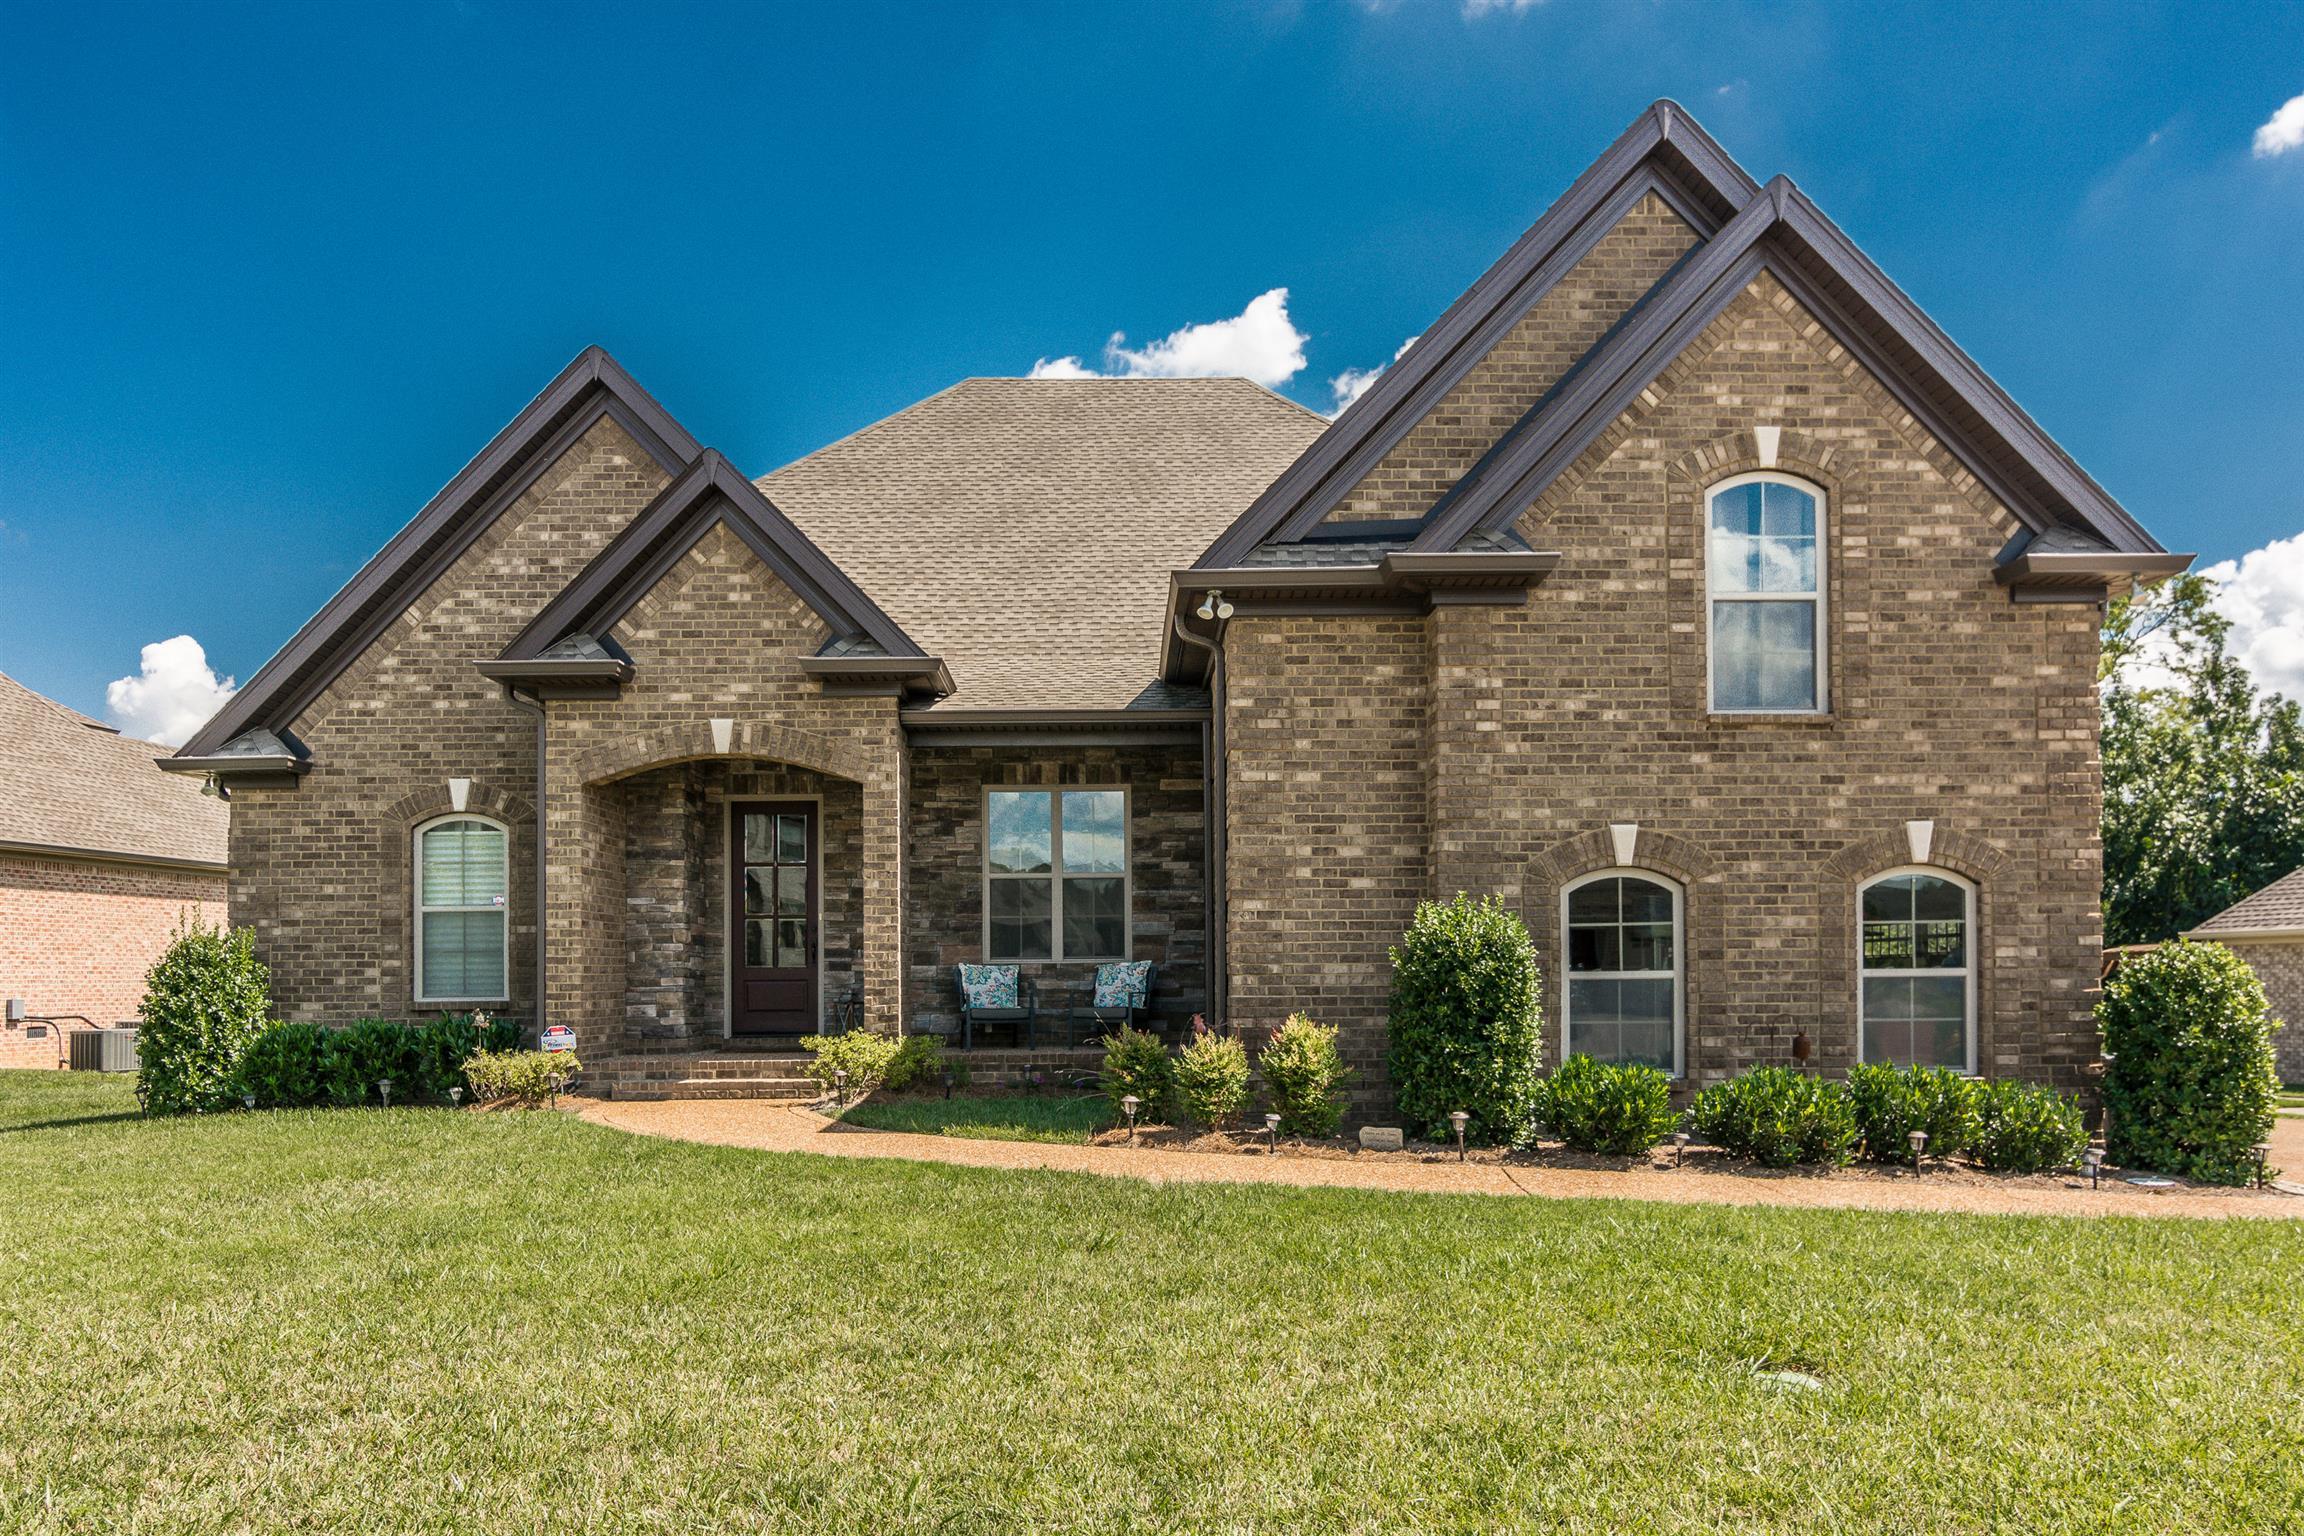 214 Scarsdale North, Hendersonville, TN 37075 - Hendersonville, TN real estate listing